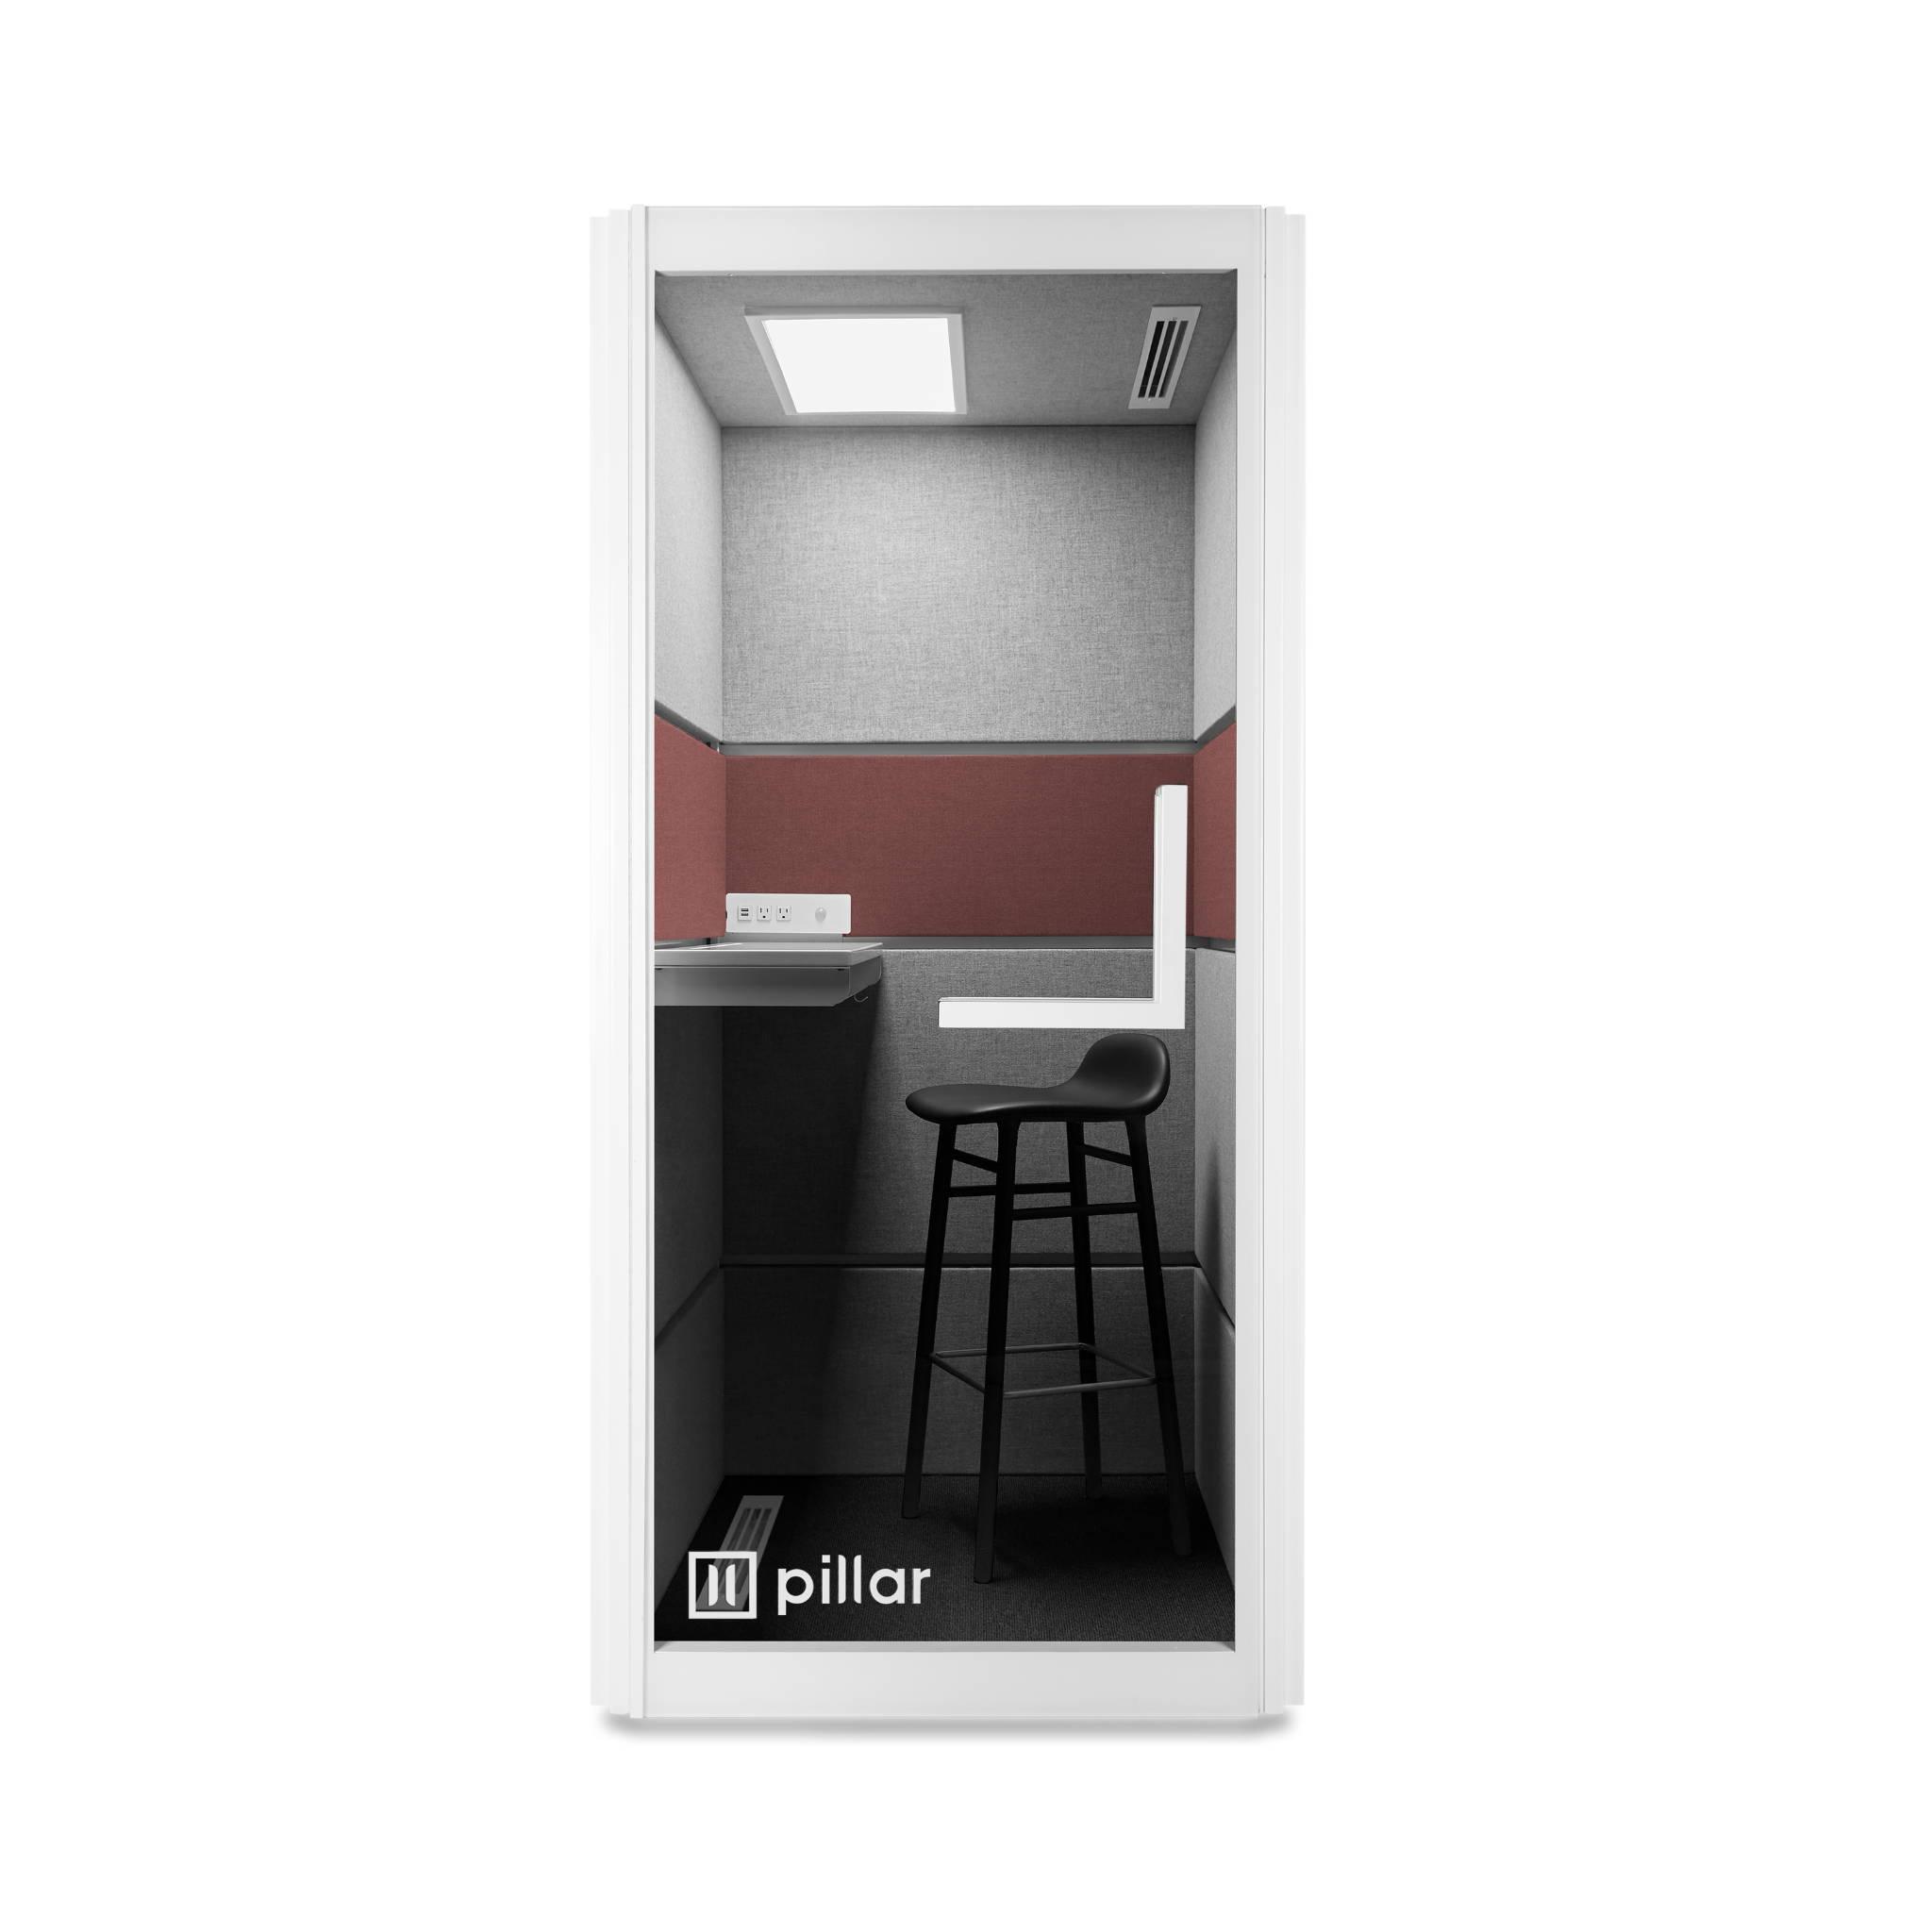 pillar booth sienna panels